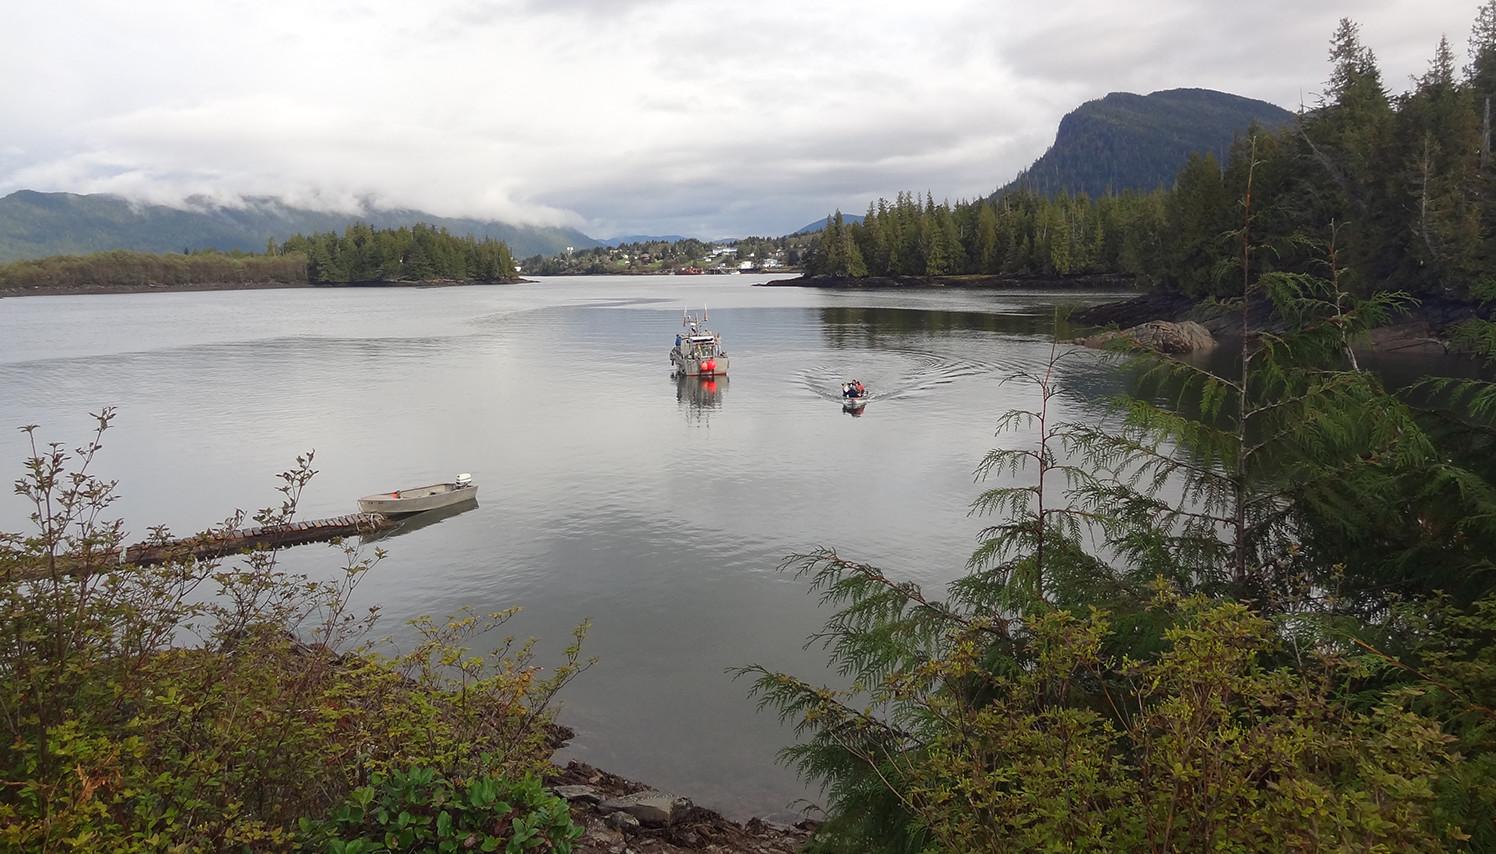 Lelu occupation Prince Rupert Sound British Columbia